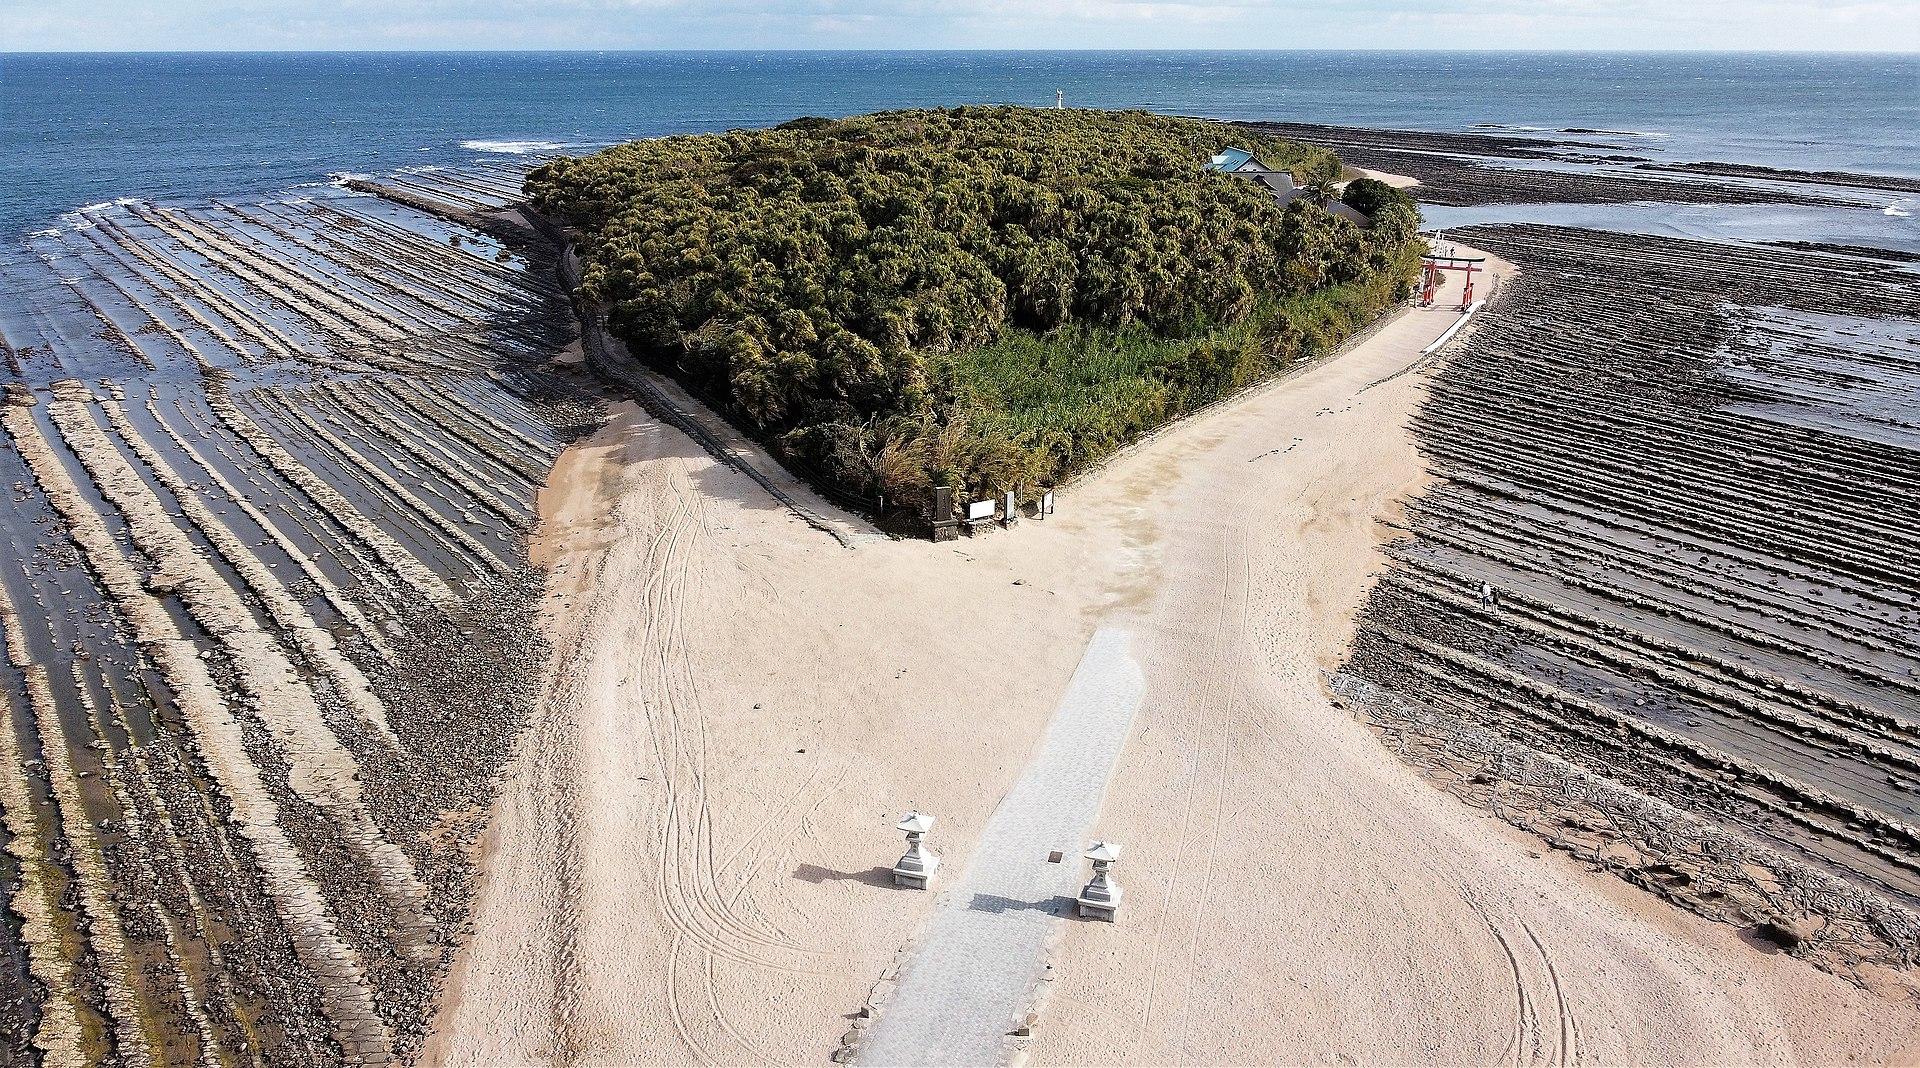 2021-01-07 Aoshima Island (Miyazaki)Aerial photography青島 (宮崎県)DJI 0249 (2)空撮.jpg